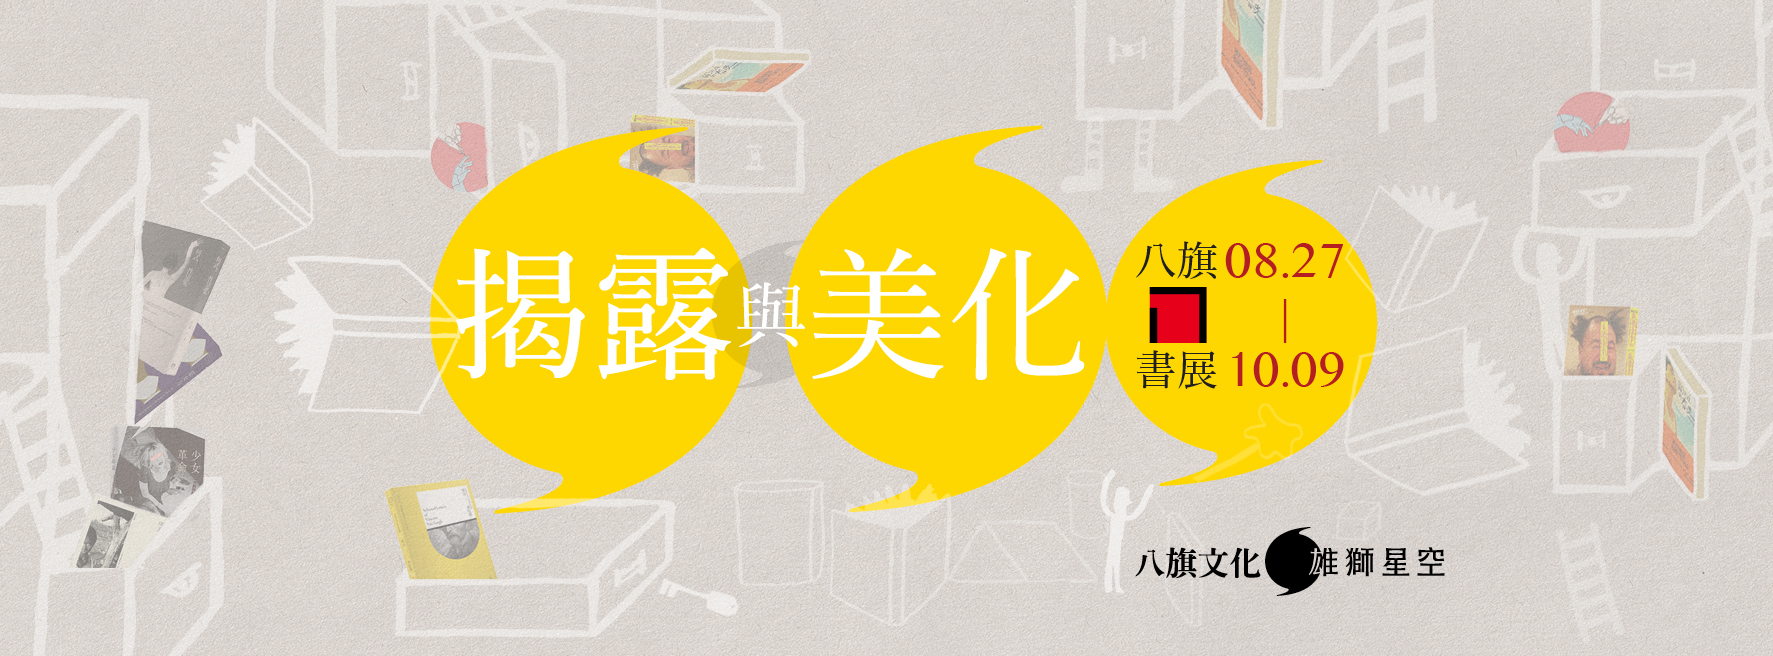 八旗書展banner-0929.jpg